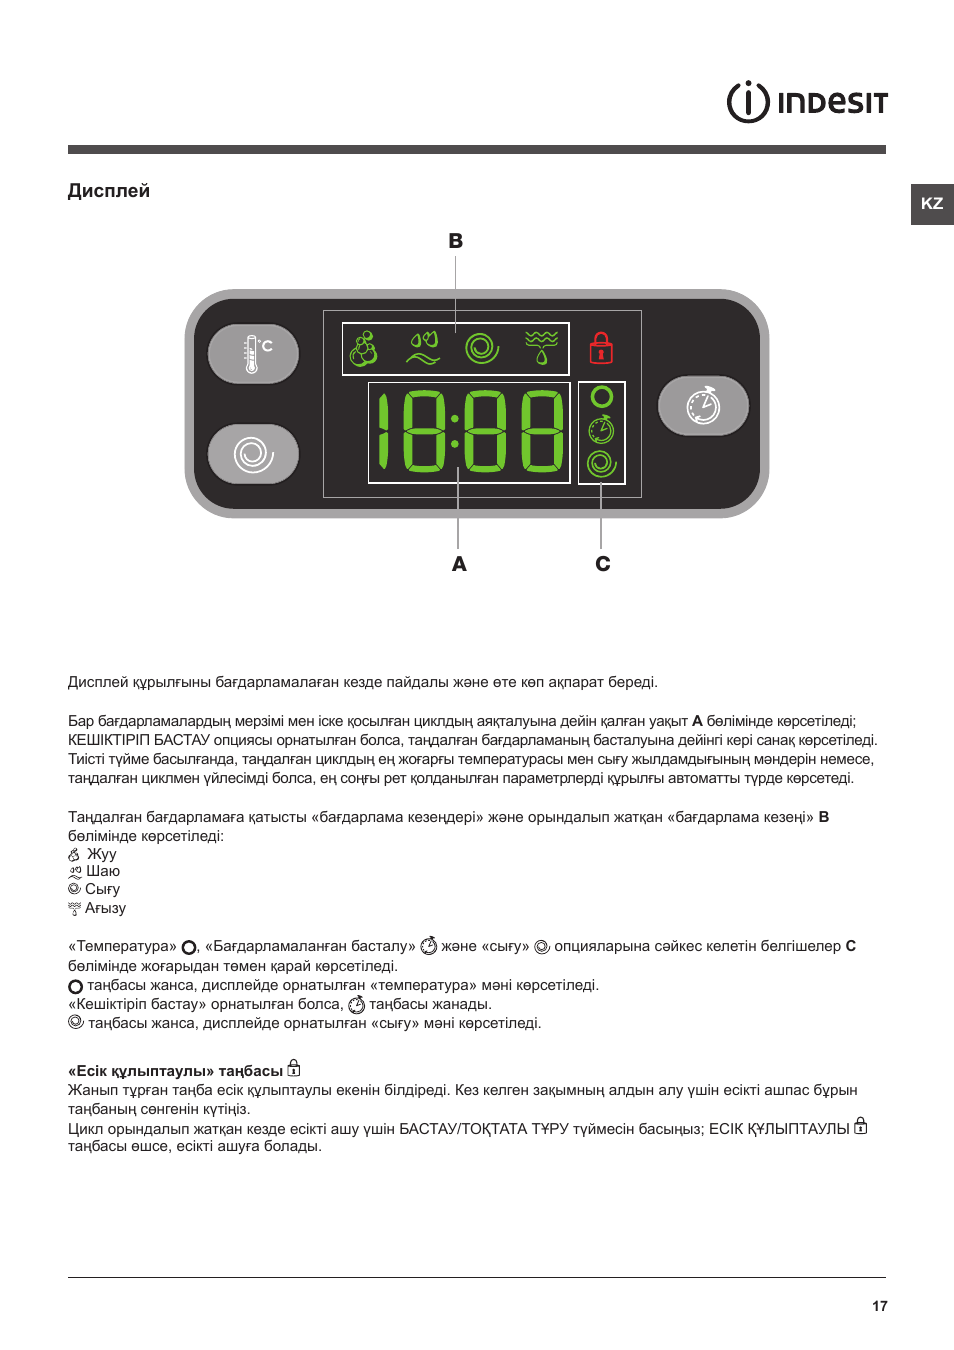 indesit iwe 6105 и инструкция